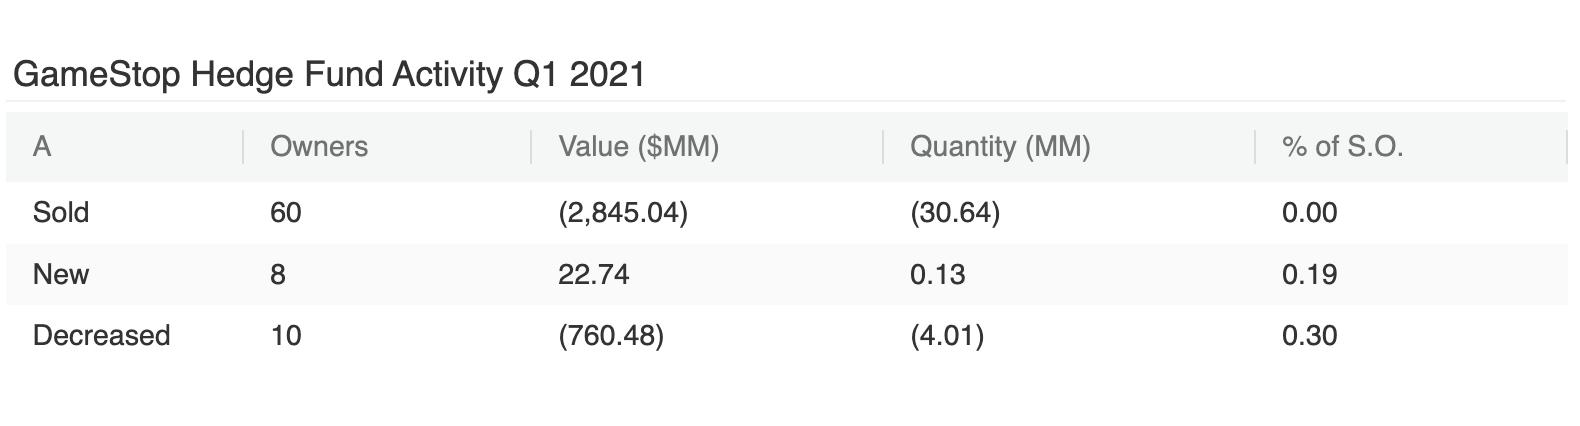 GameStop Q1 Hedge Fund Shareholder Activity